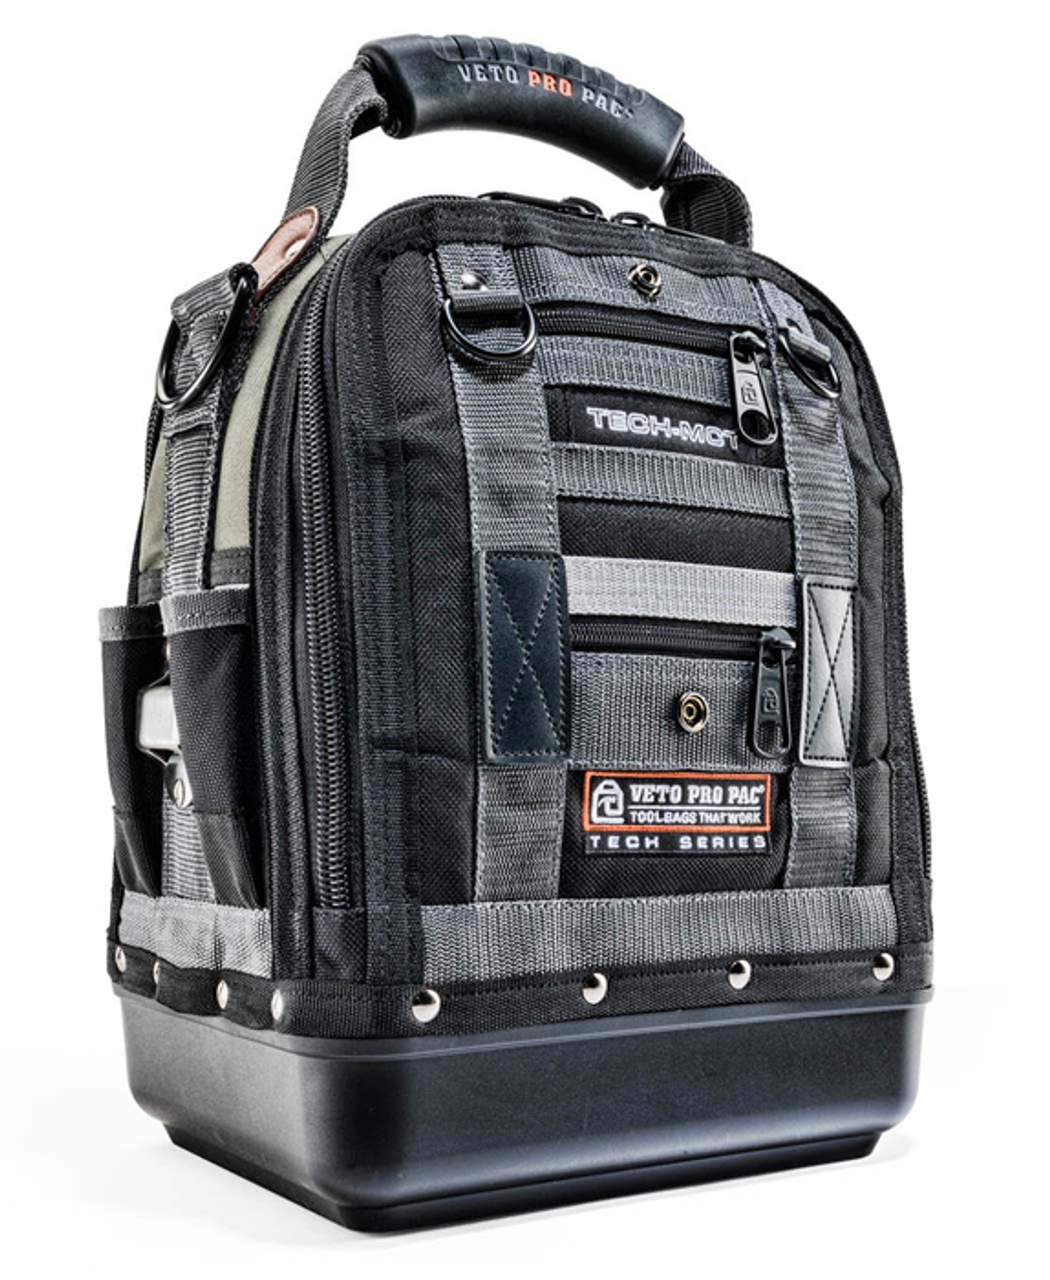 Veto Pro Pac Tech Mct Heavy Duty Tool Bag